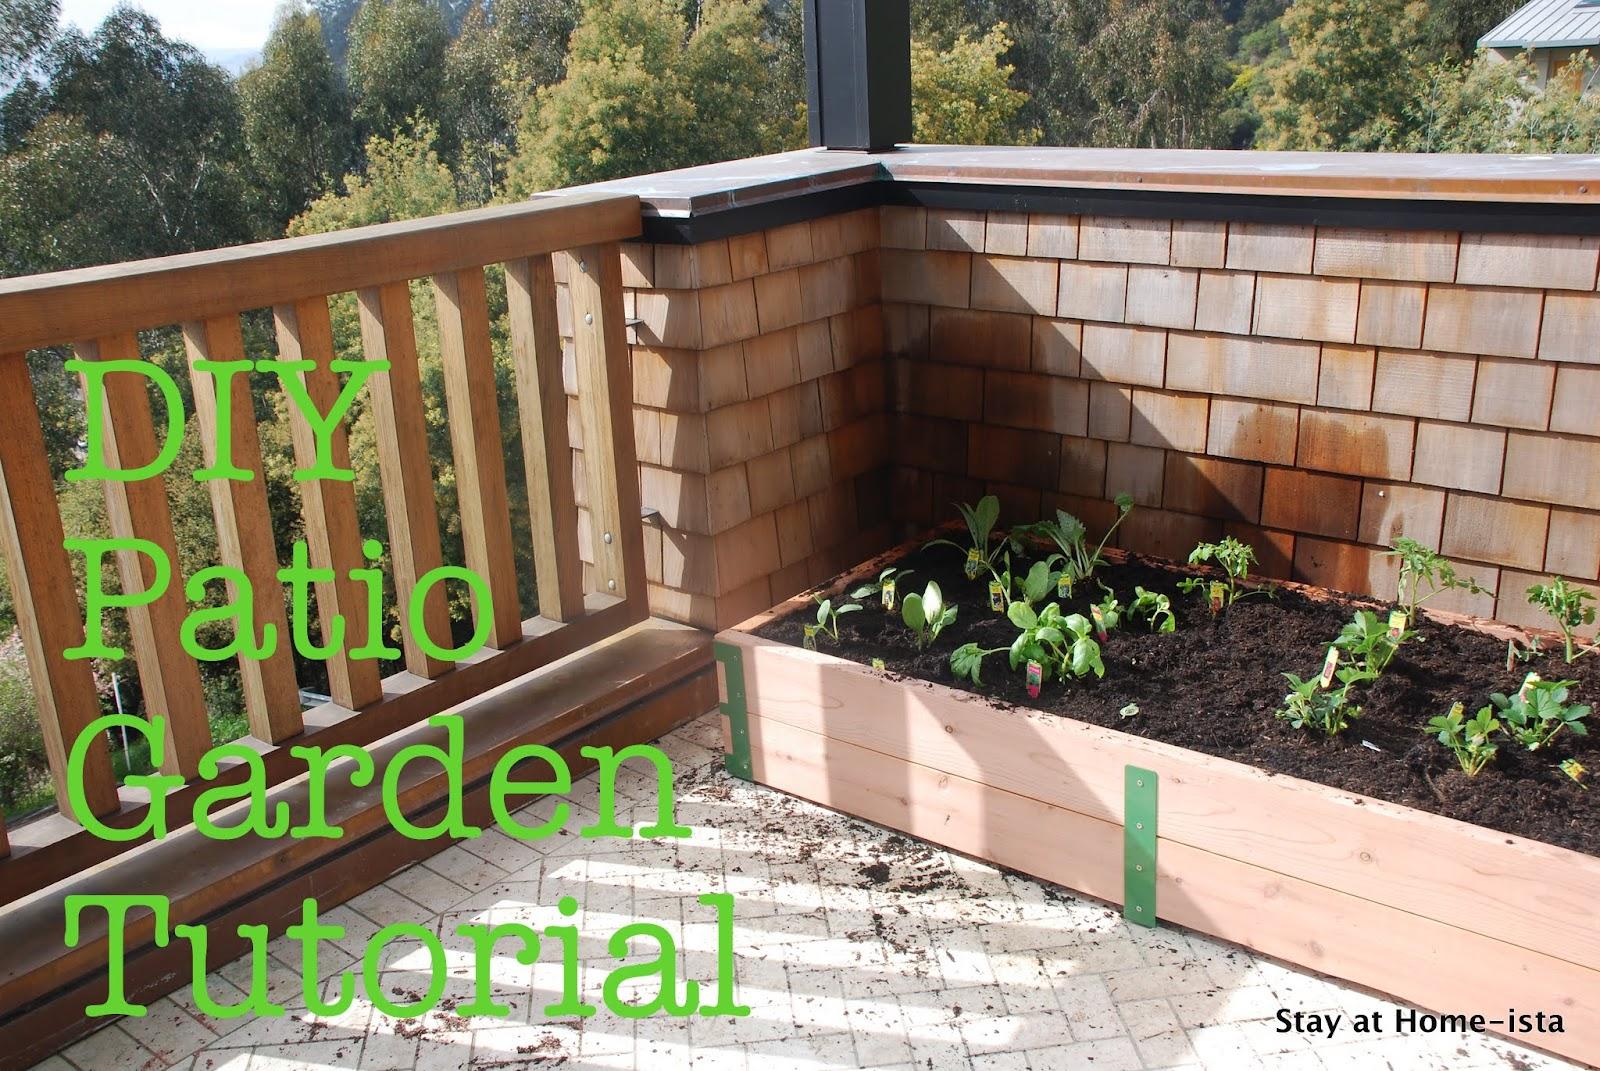 Stay at Home-ista: A DIY Patio Garden